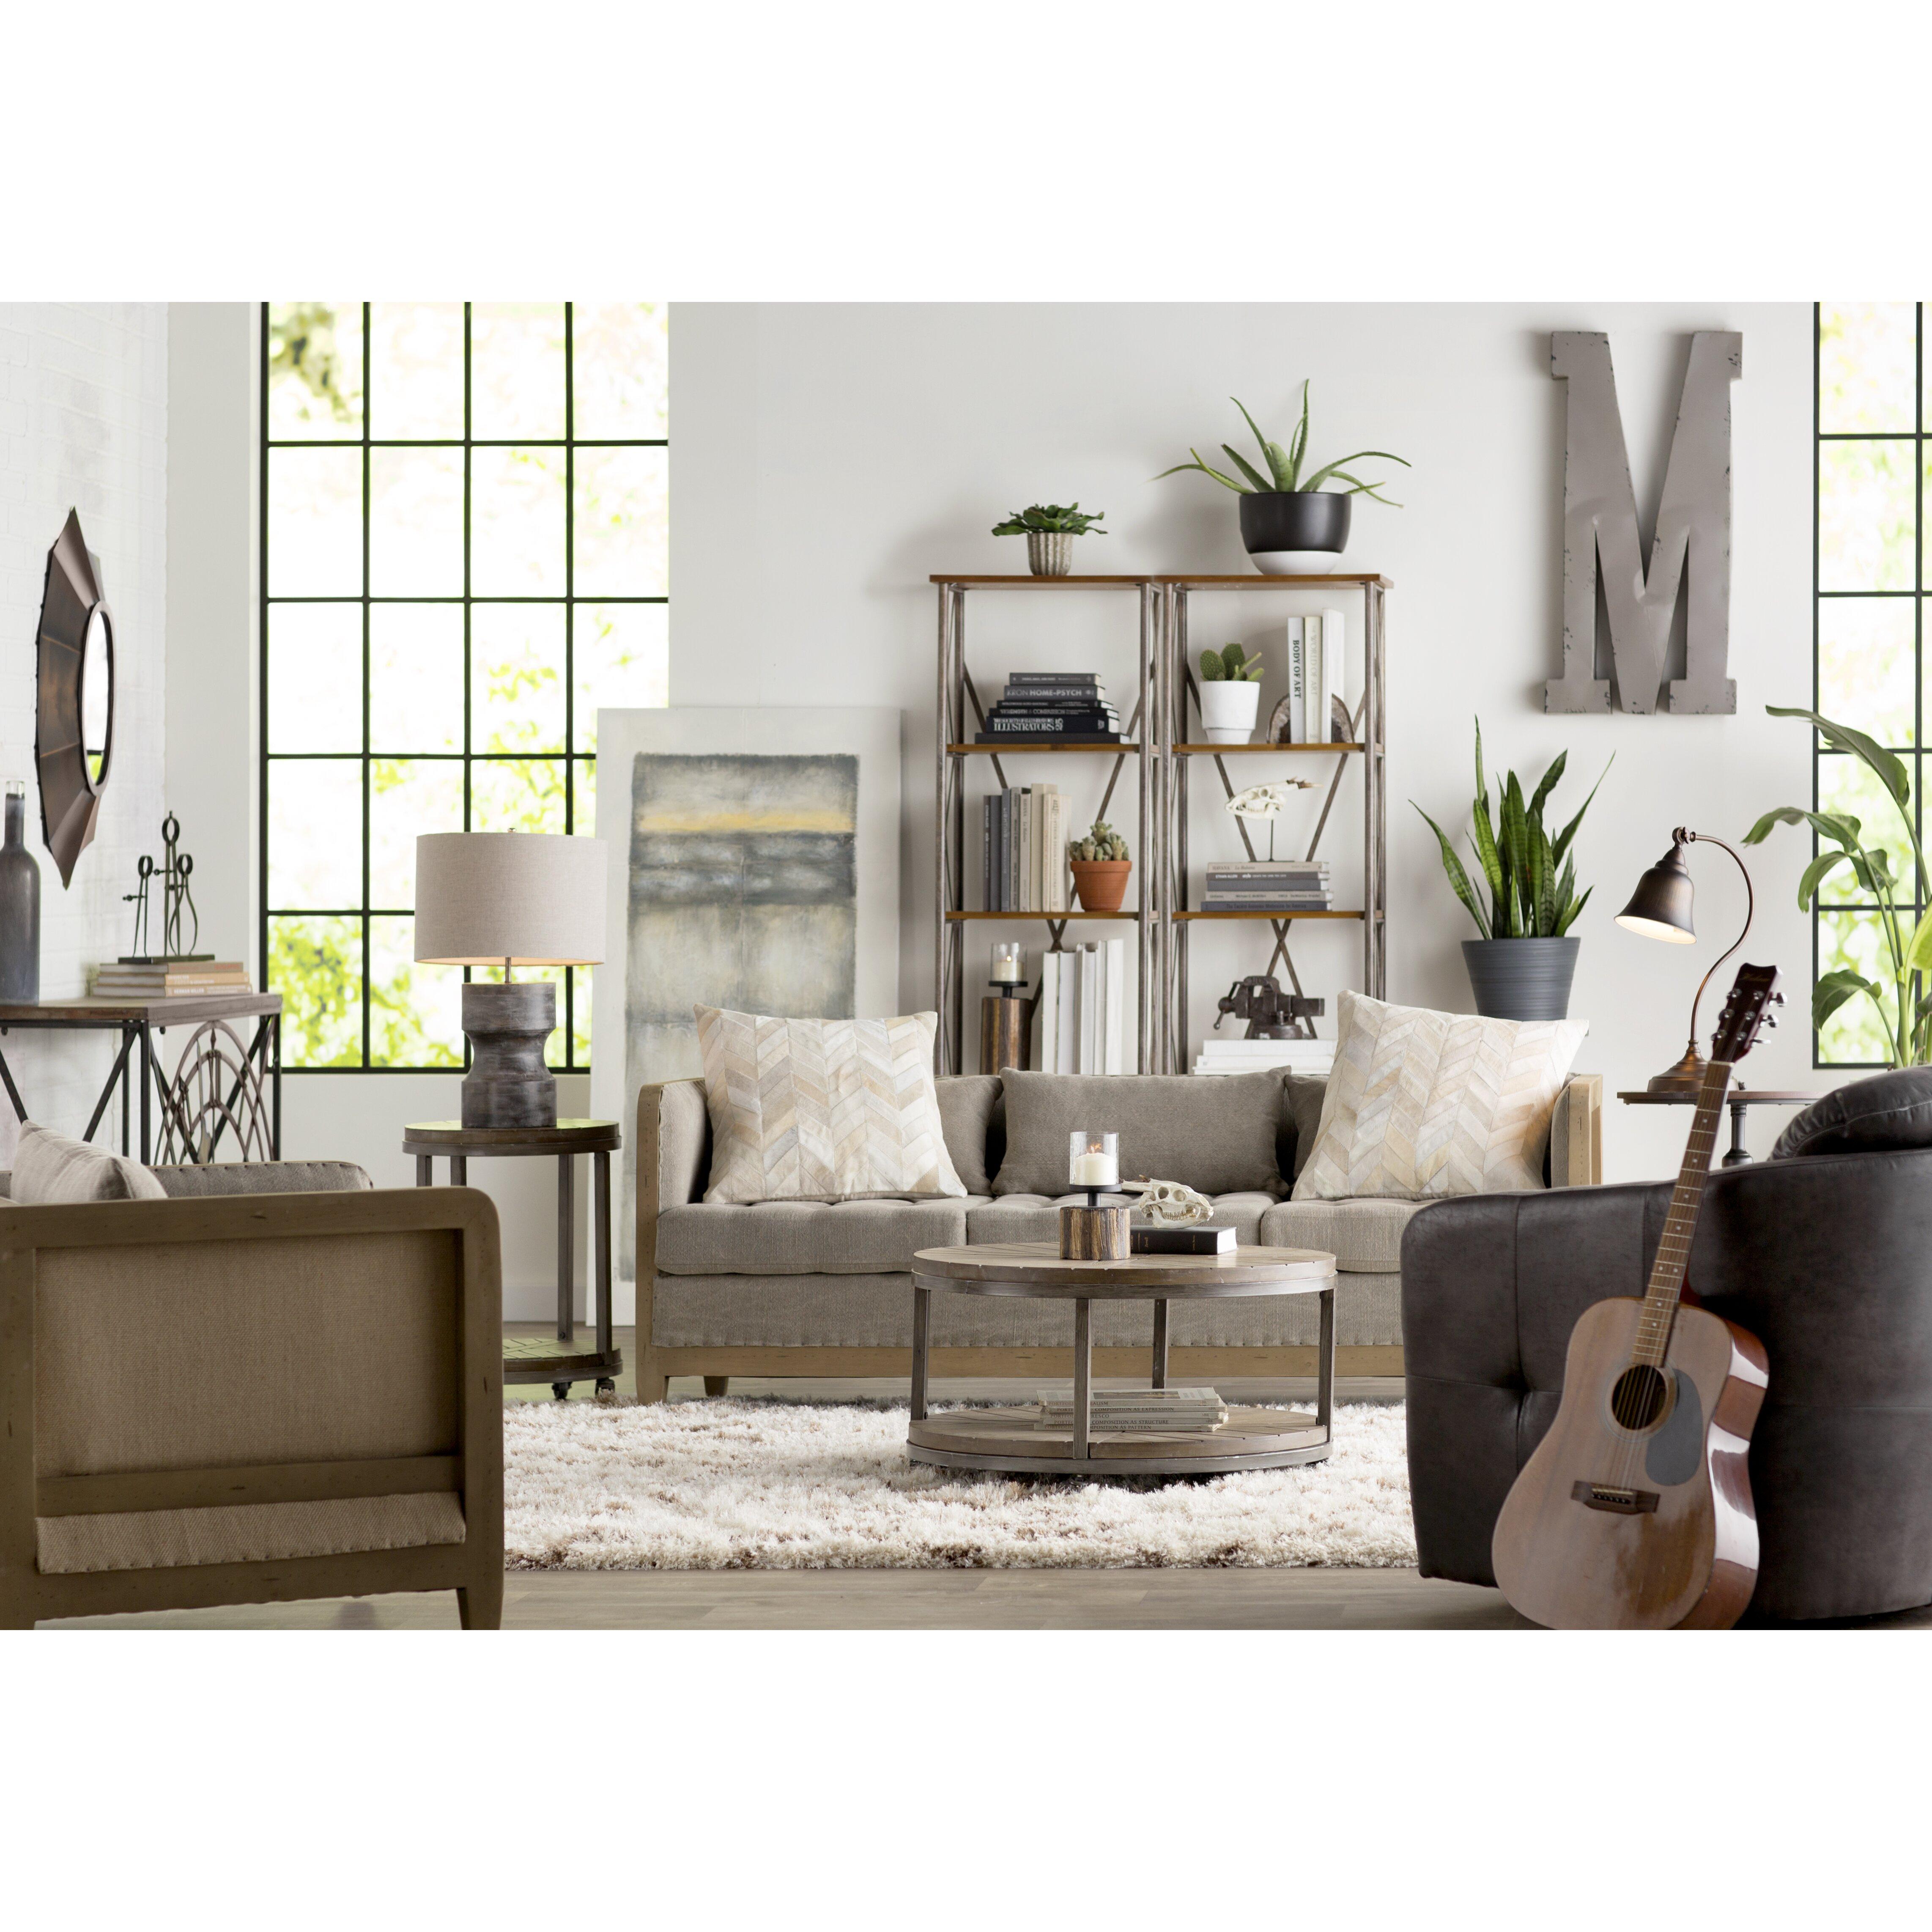 Swivel Club Chairs For Living Room Trent Austin Design Roanoke Swivel Club Chair Reviews Wayfair